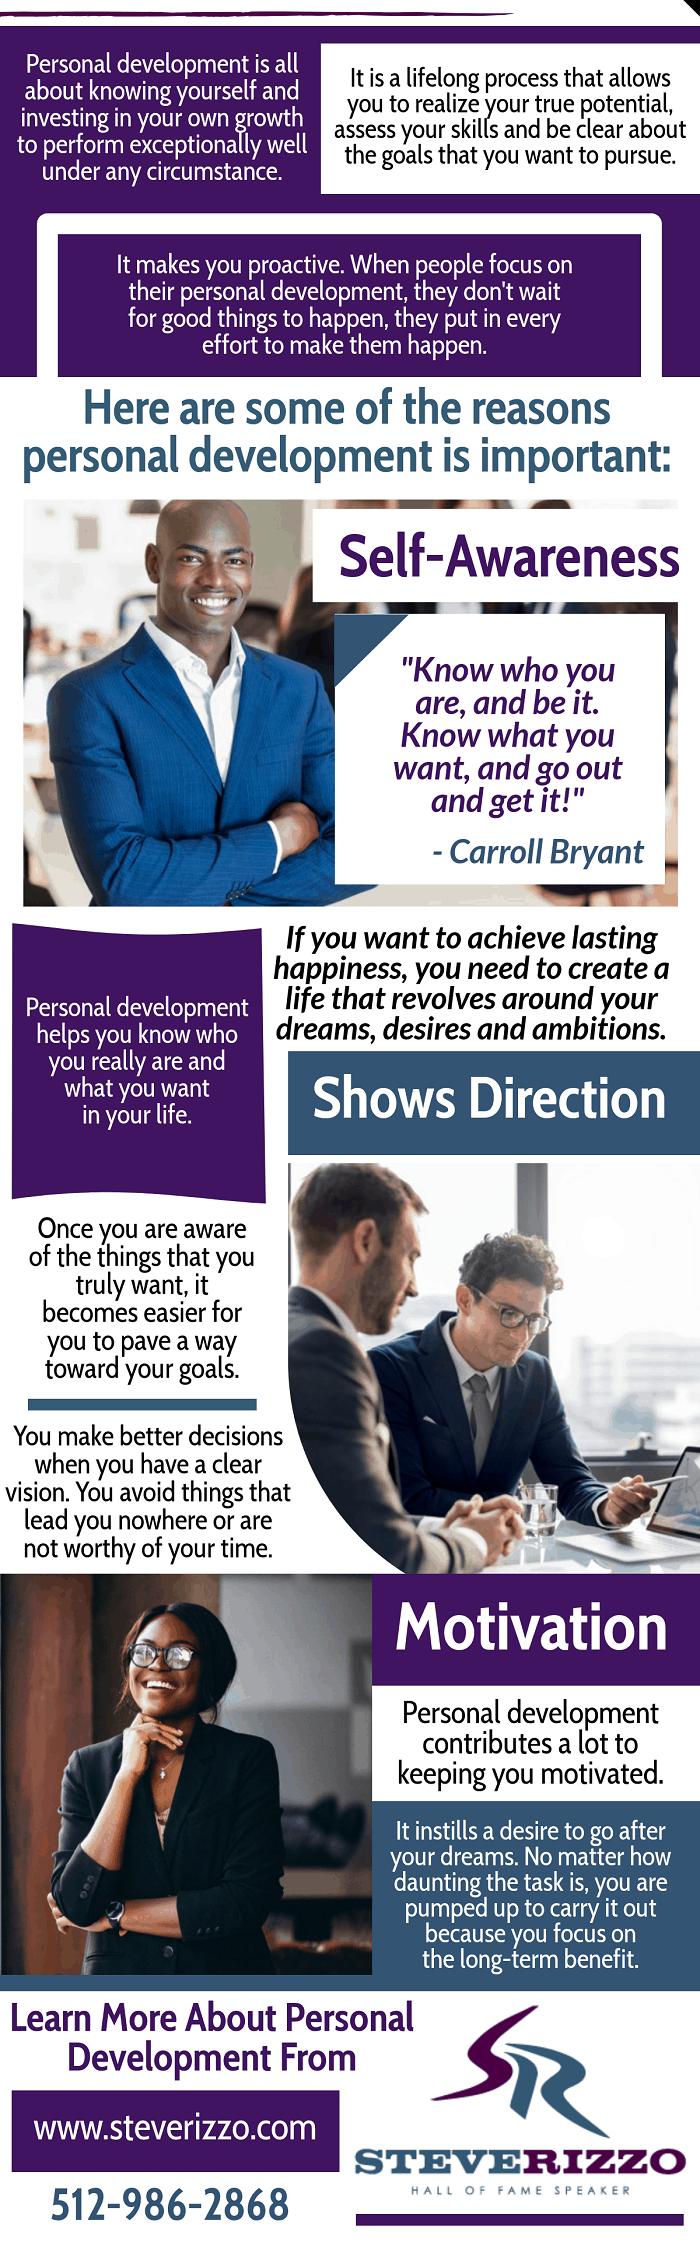 Personal Development - Personal Development - Why is it so Important?